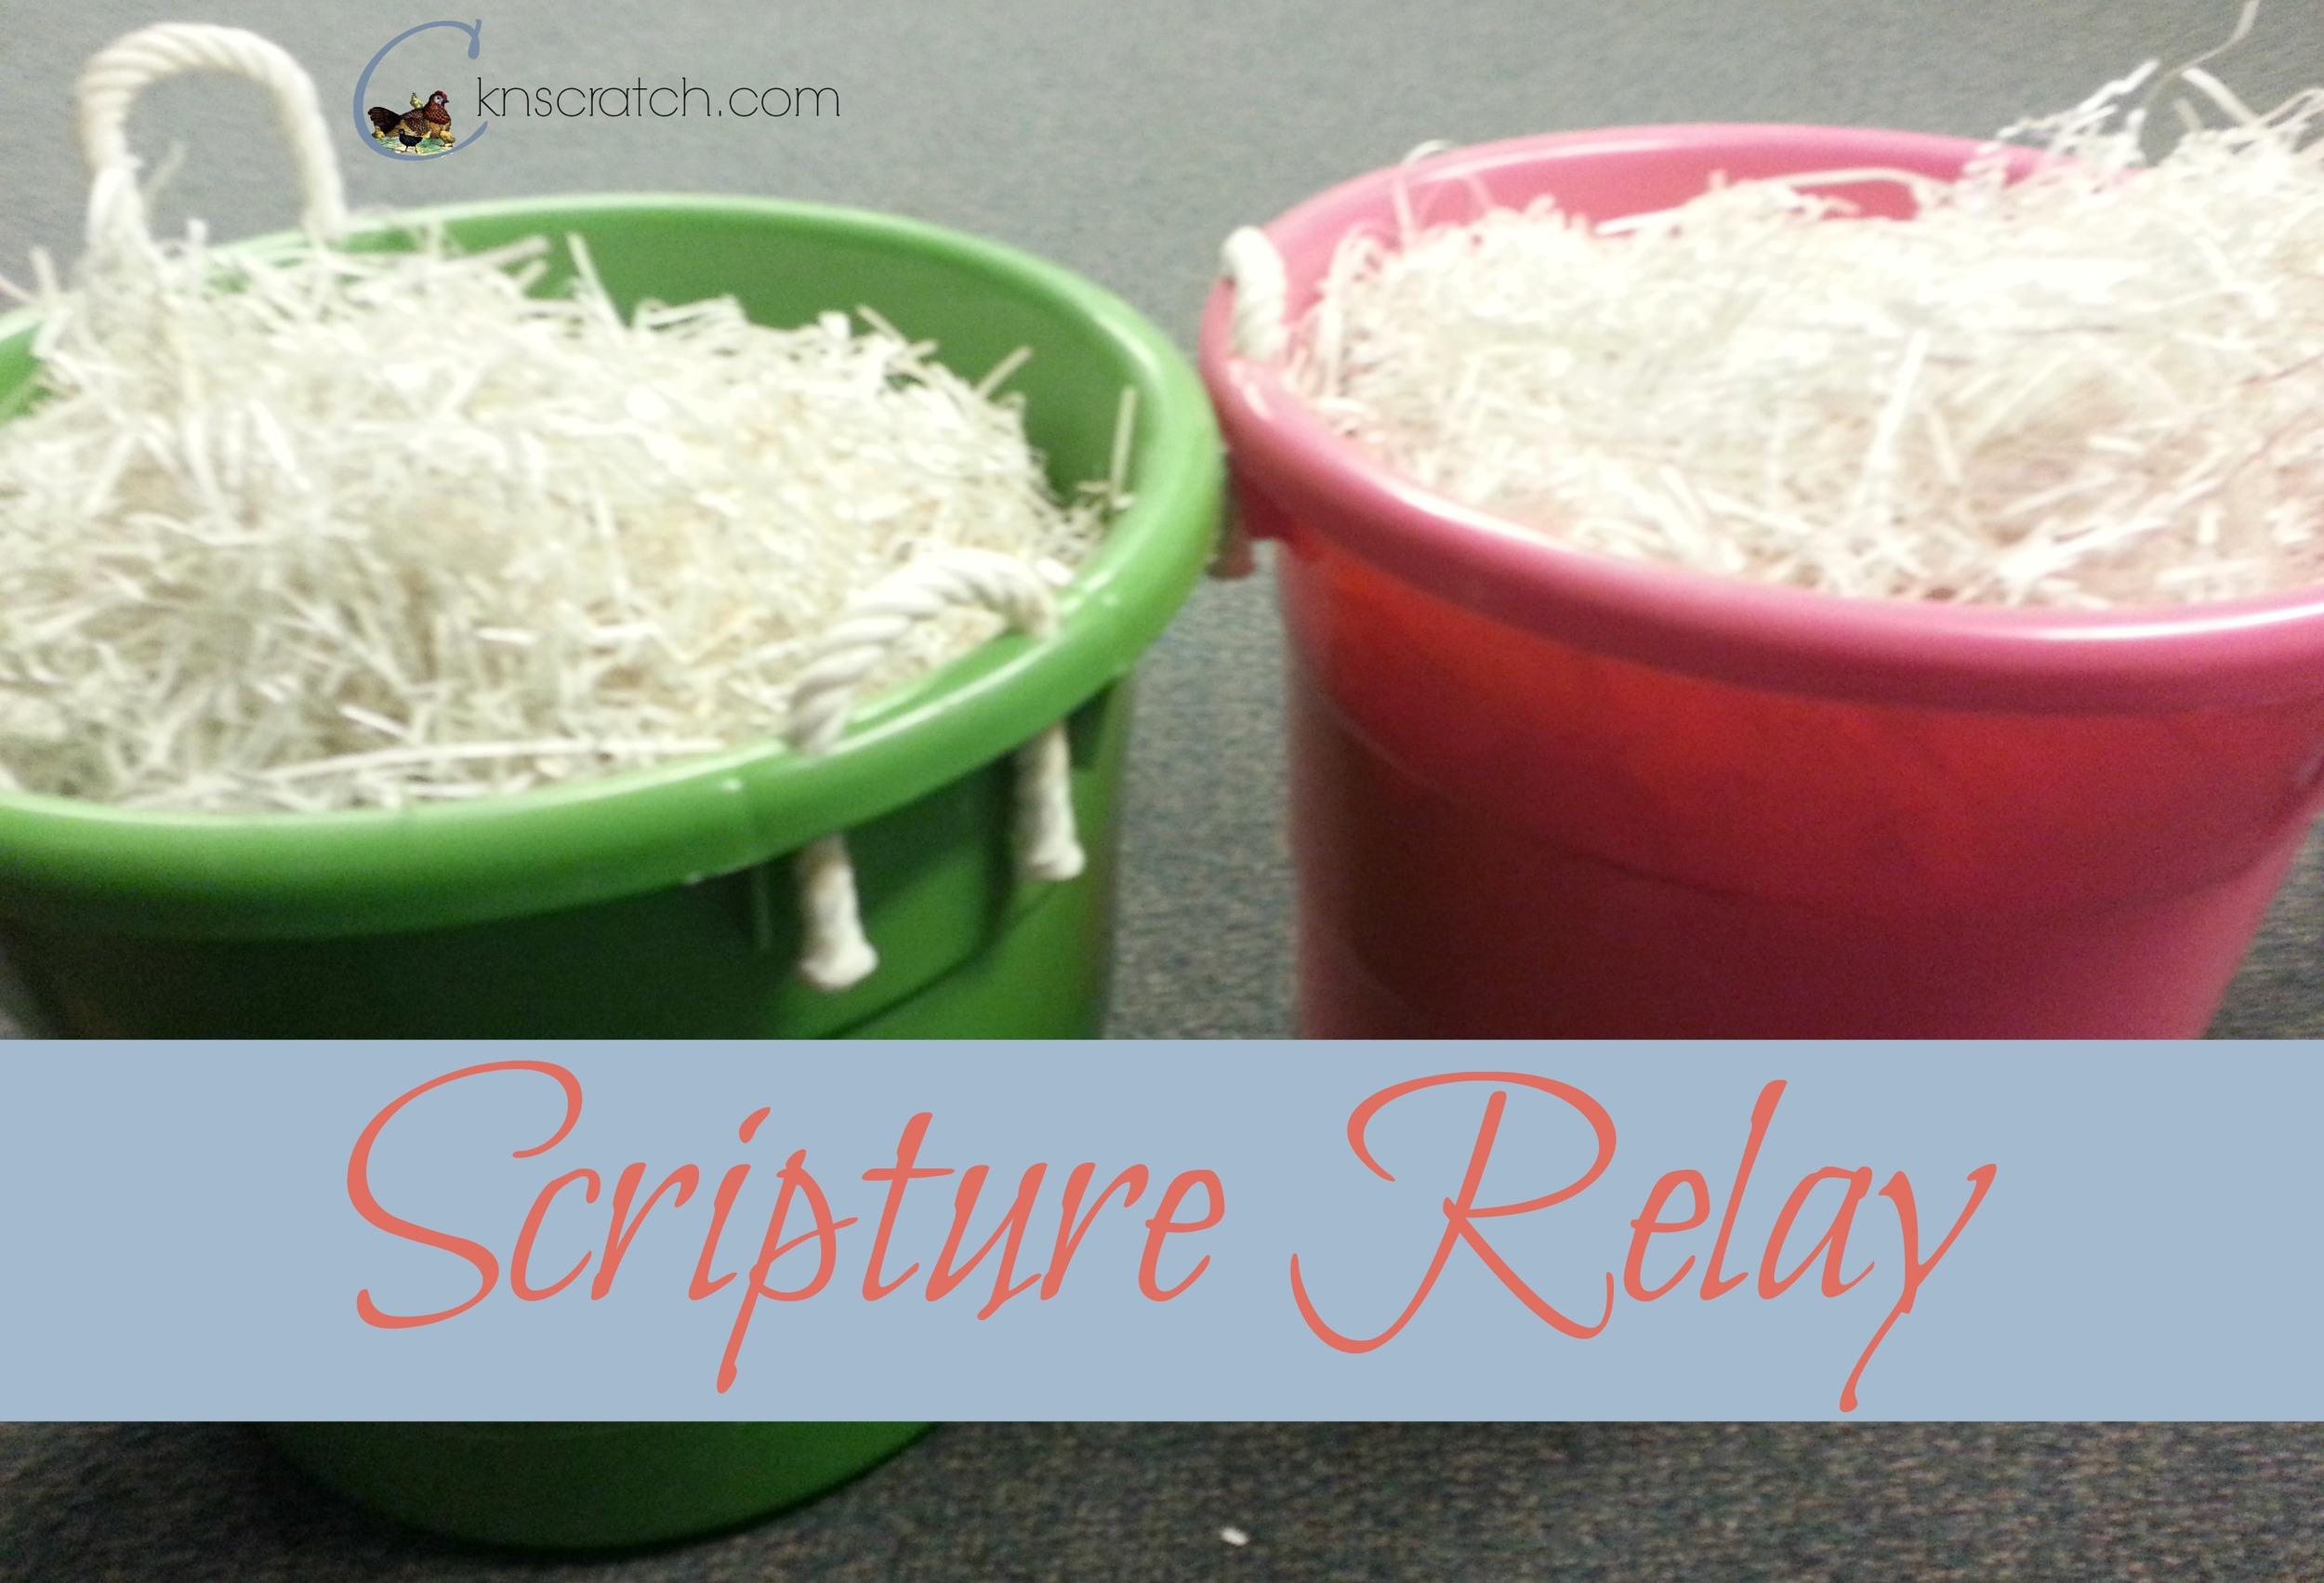 Shredded Paper plus Scriptures= Fun Scripture Relay Race